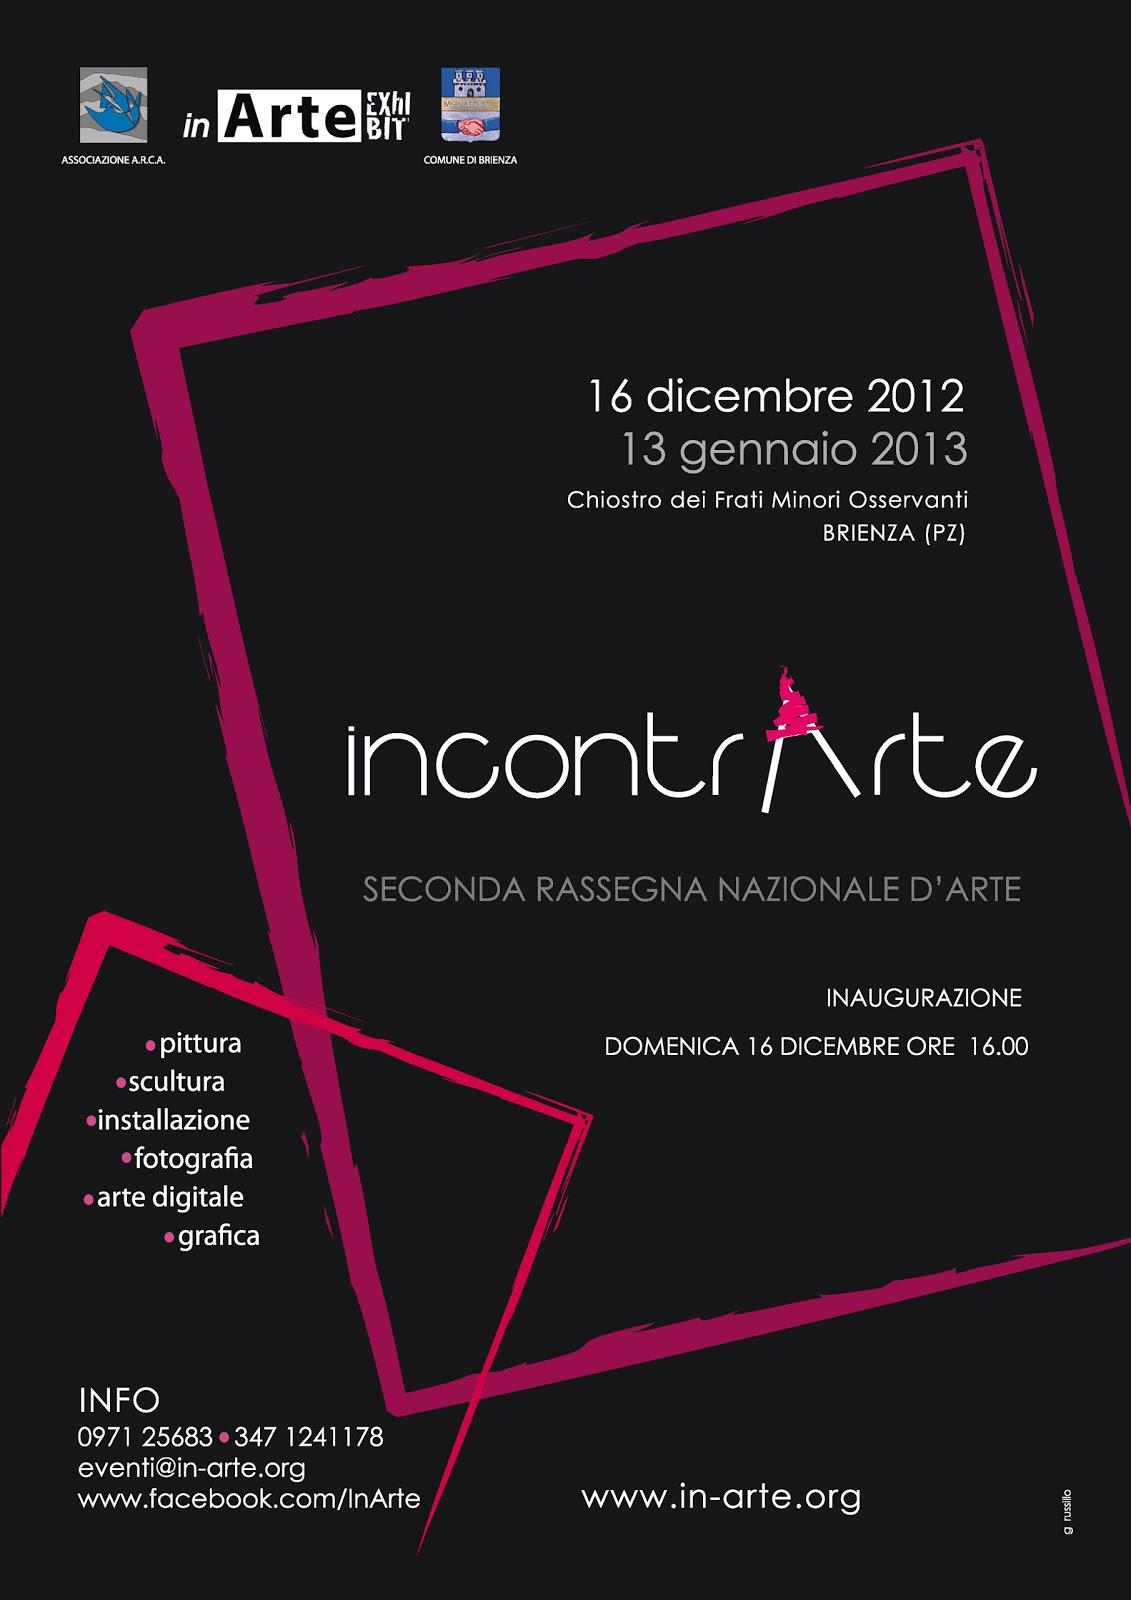 http://inarte-blog.blogspot.it/2012/12/incontrarte-2012-2-rassegna-nazionale.html